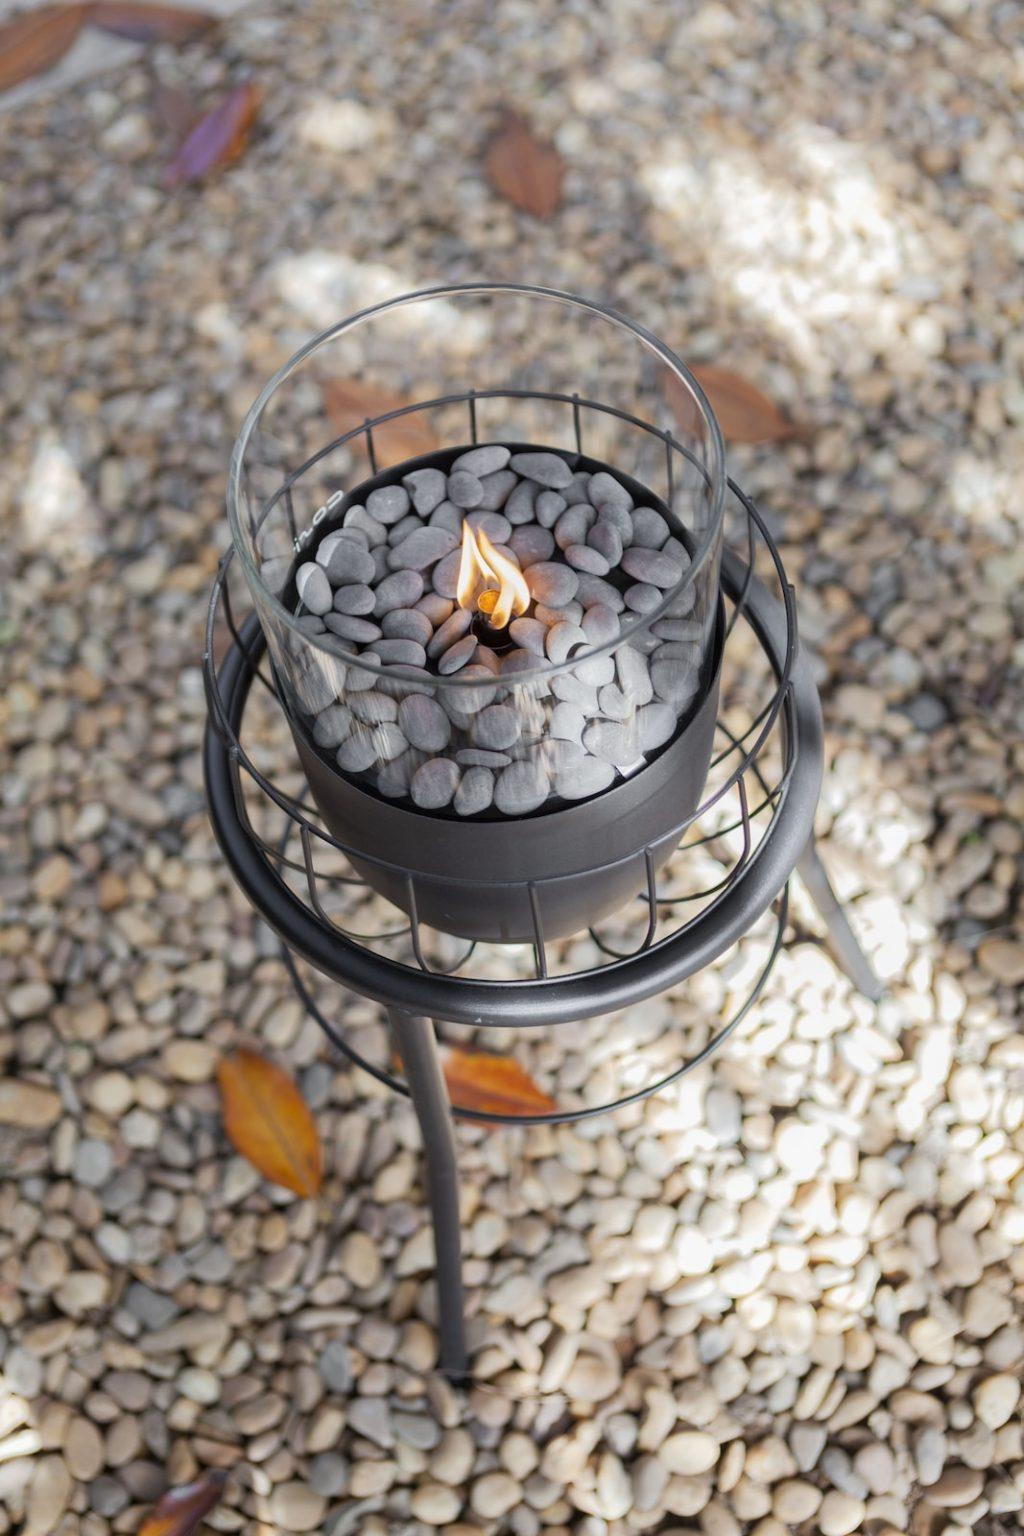 BUTSIR-farolillos-a-gas-Basket high_MG_8763_uatxut_pedres